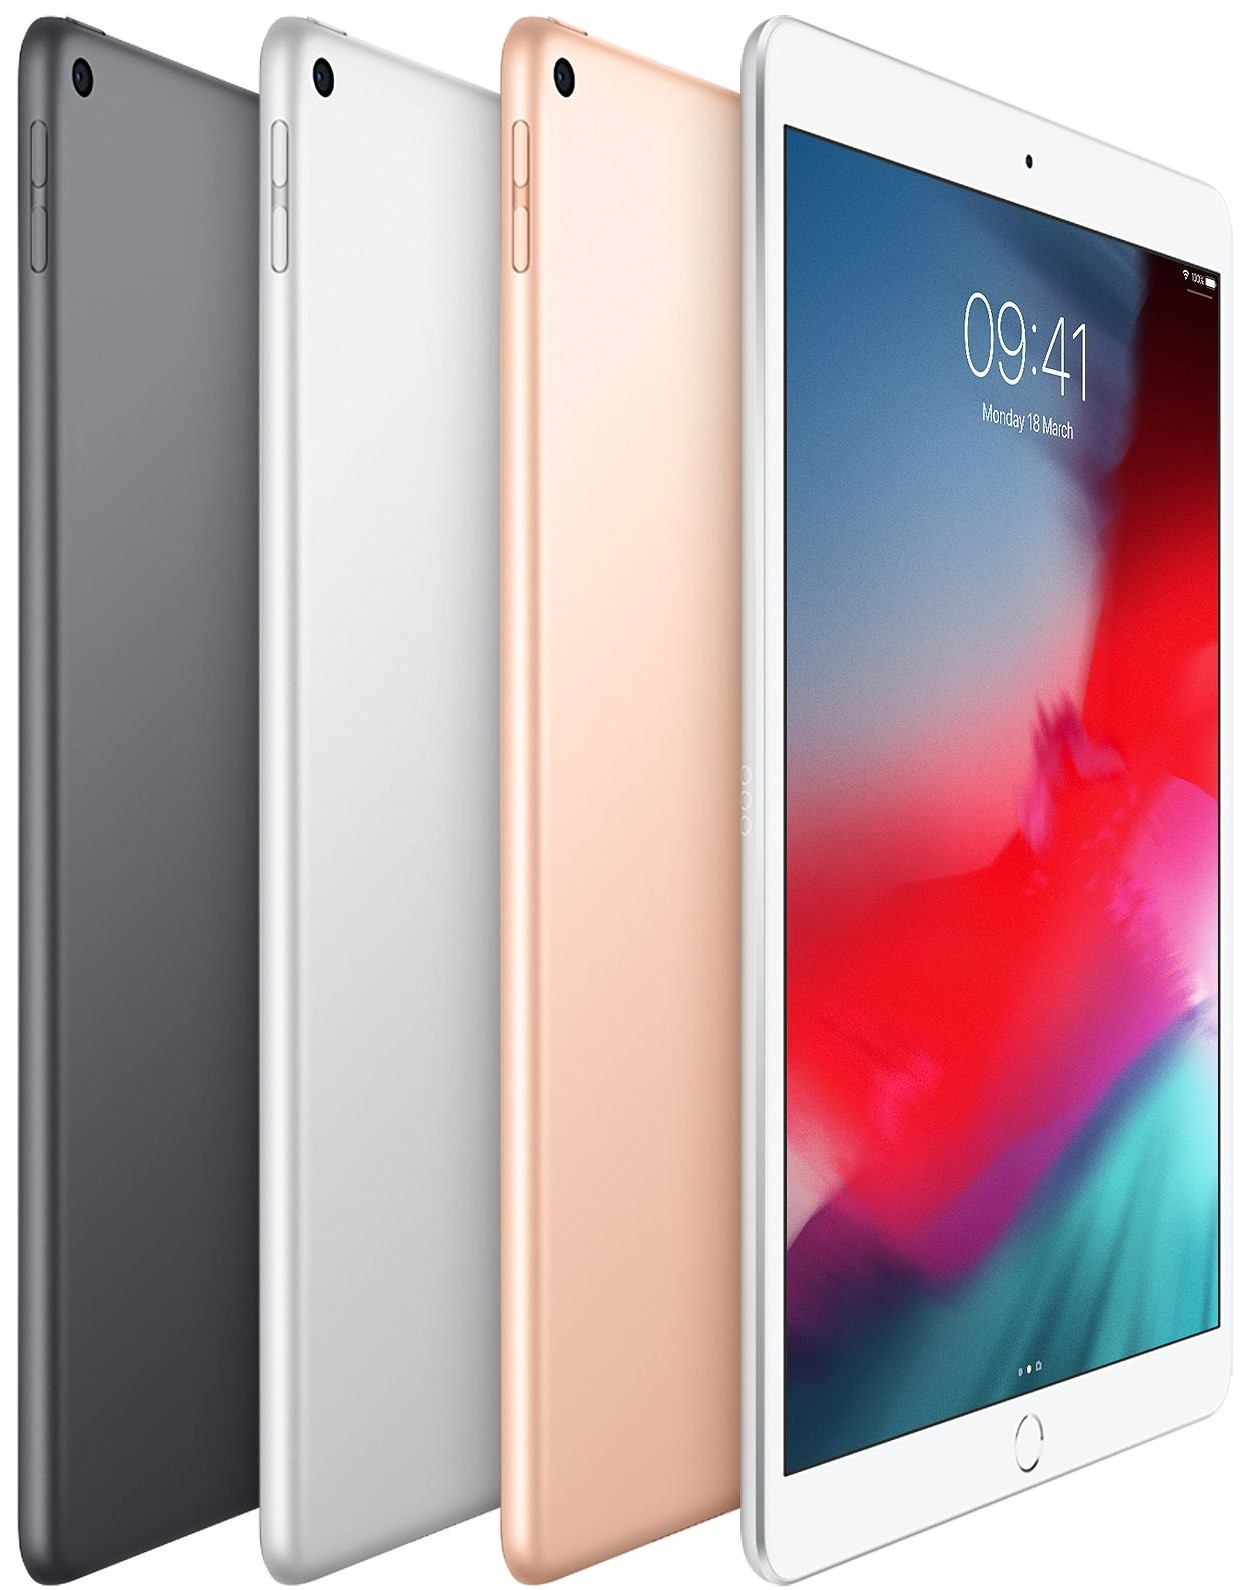 Планшет Apple iPad Air 10.5 Wi-Fi 64Gb MUUK2RU/A (2019) Silver